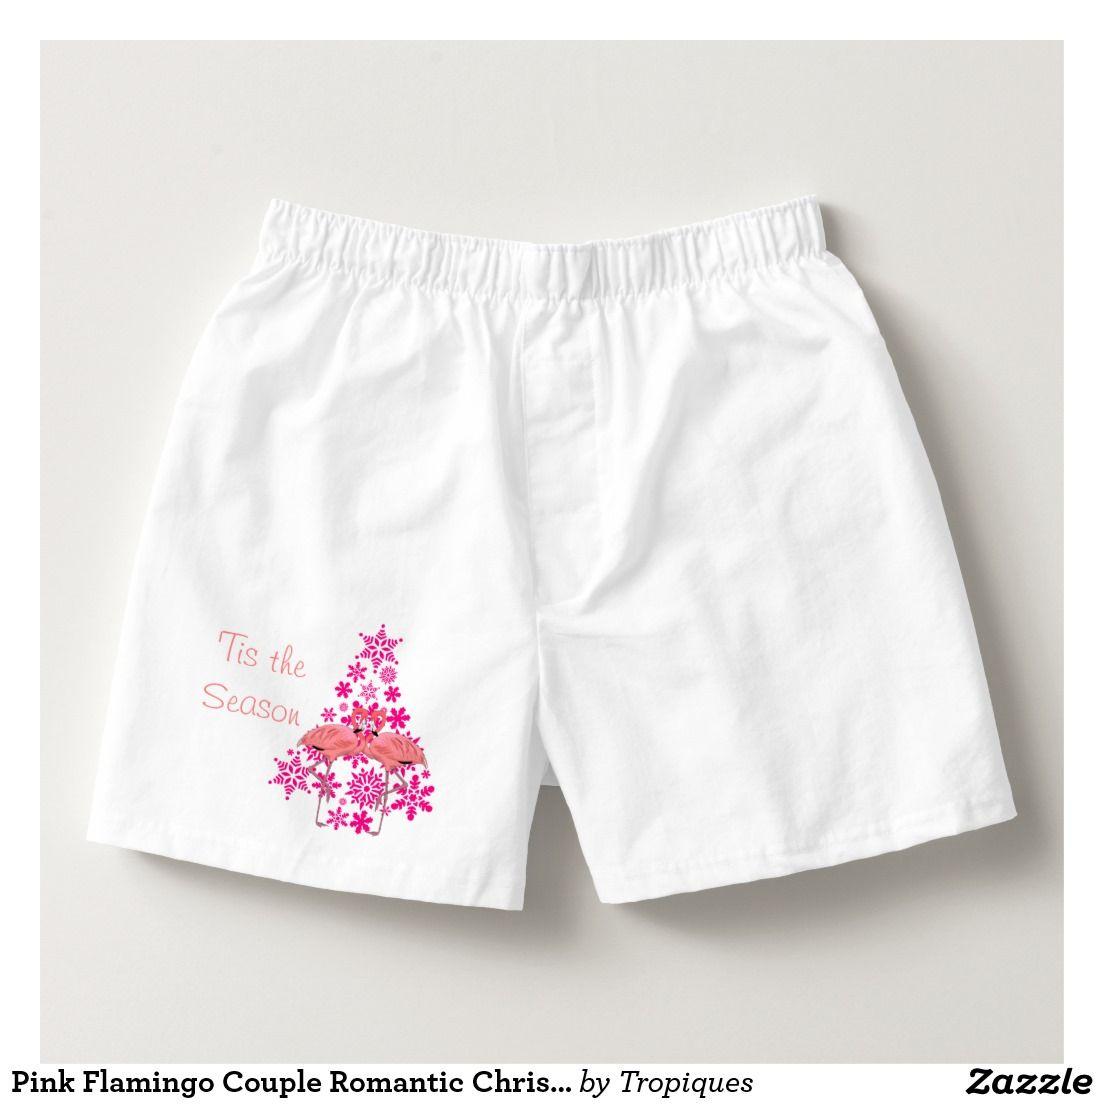 f47b4748a276 Pink Flamingo Couple Romantic Christmas Boxers | Zazzle.com ...